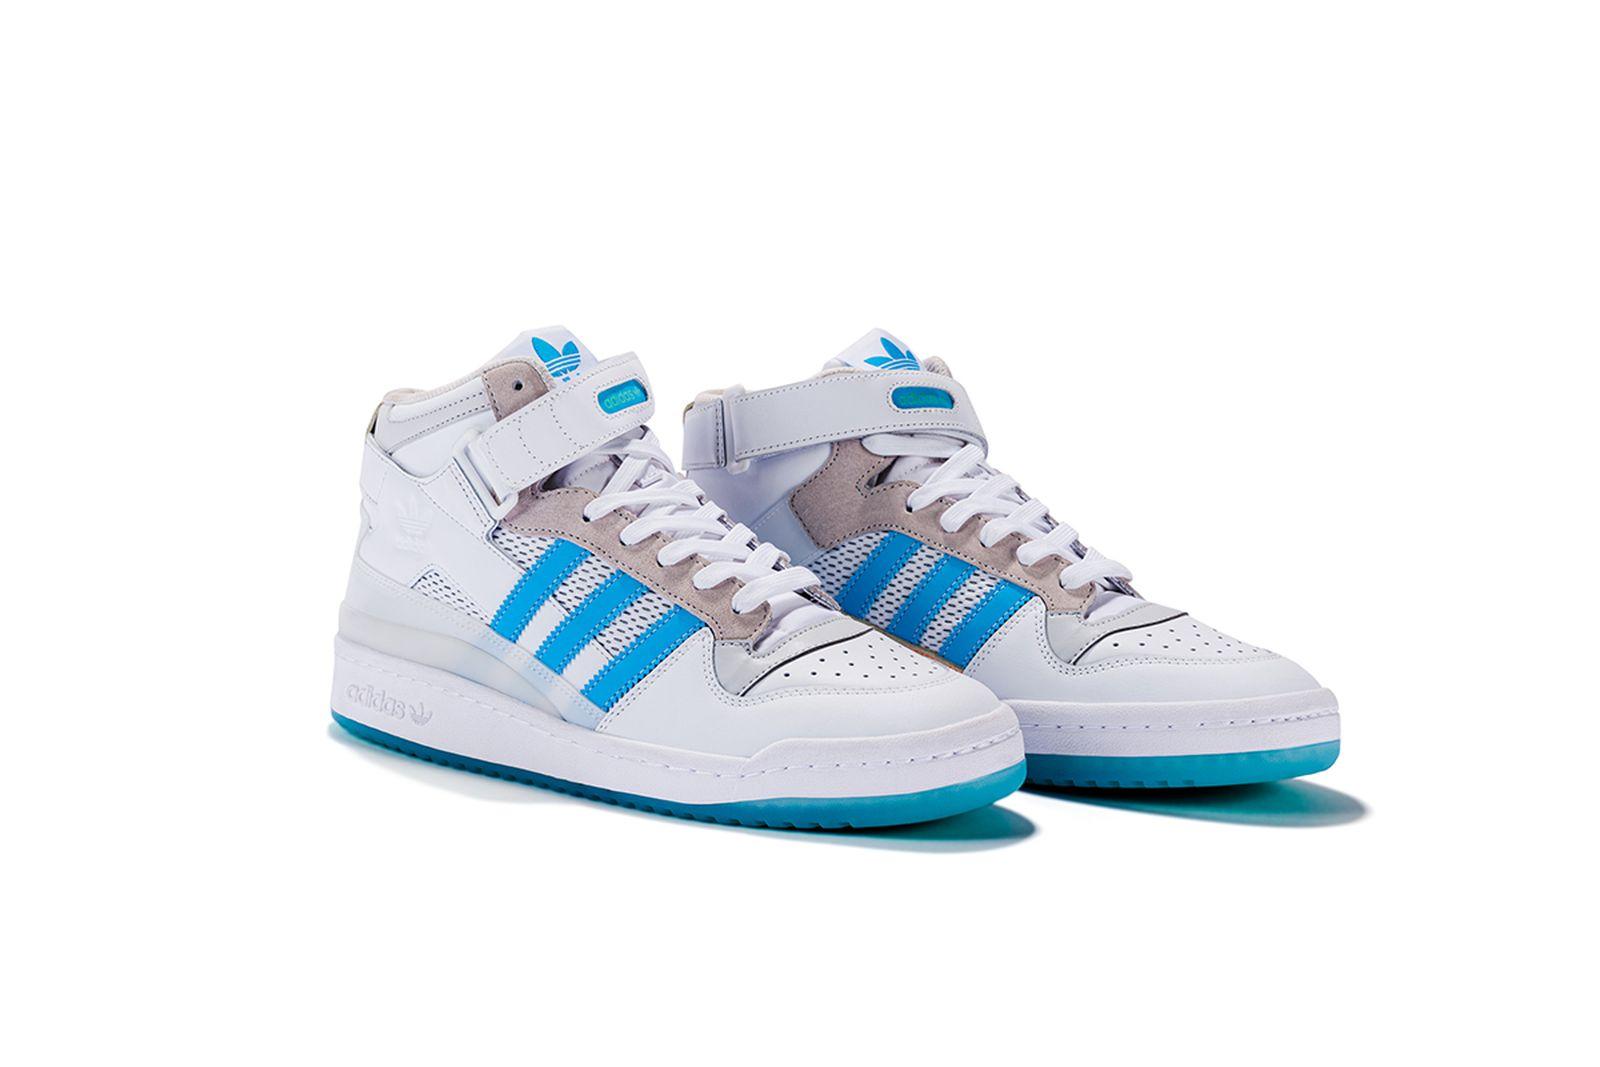 adidas-skateboarding-forum-84-adv-diego-najera-release-date-price-1-10